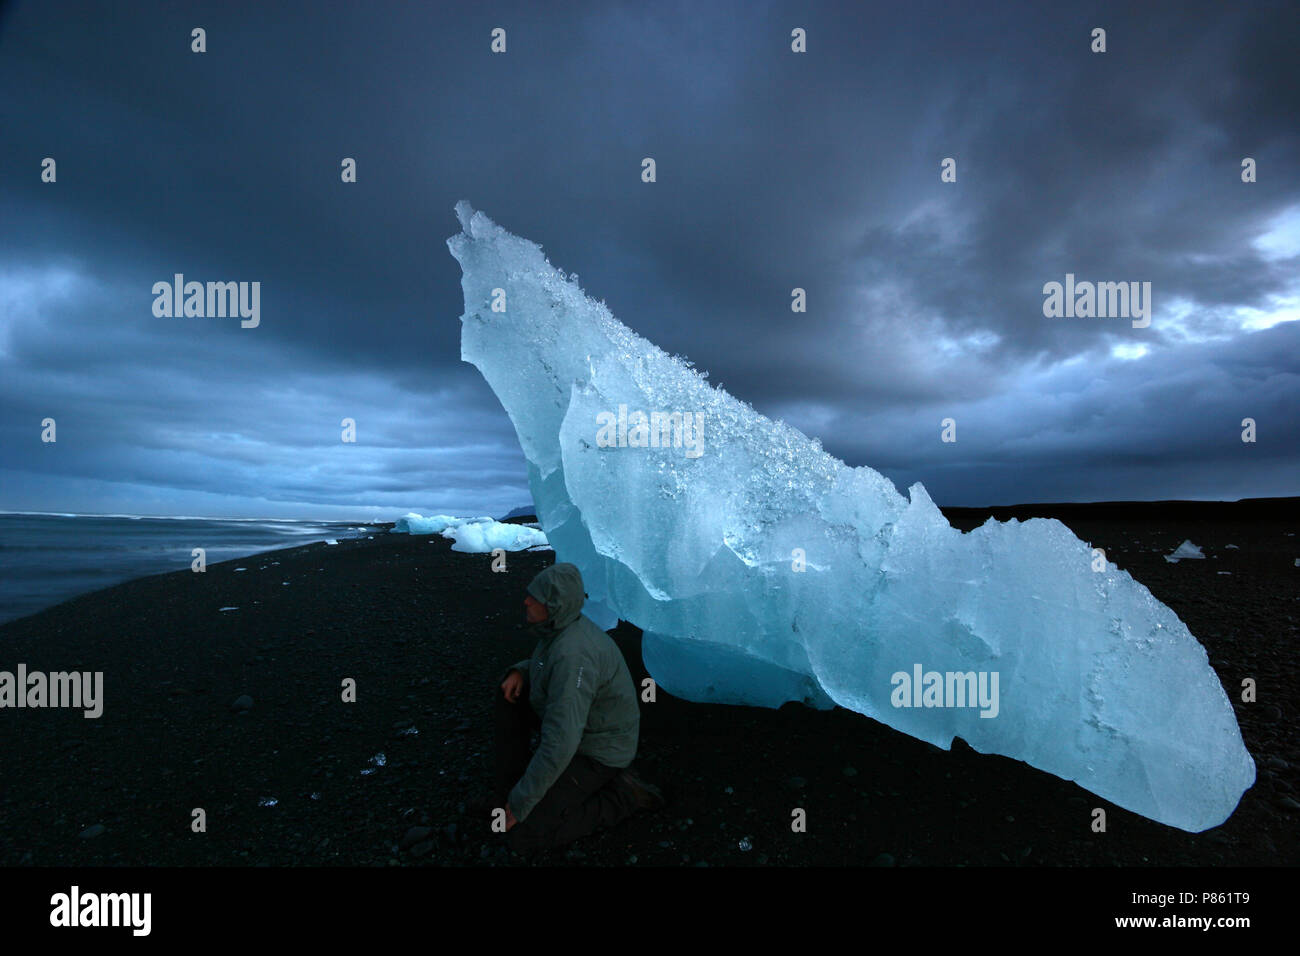 Toerist op IJsland; Tourist on Iceland - Stock Image